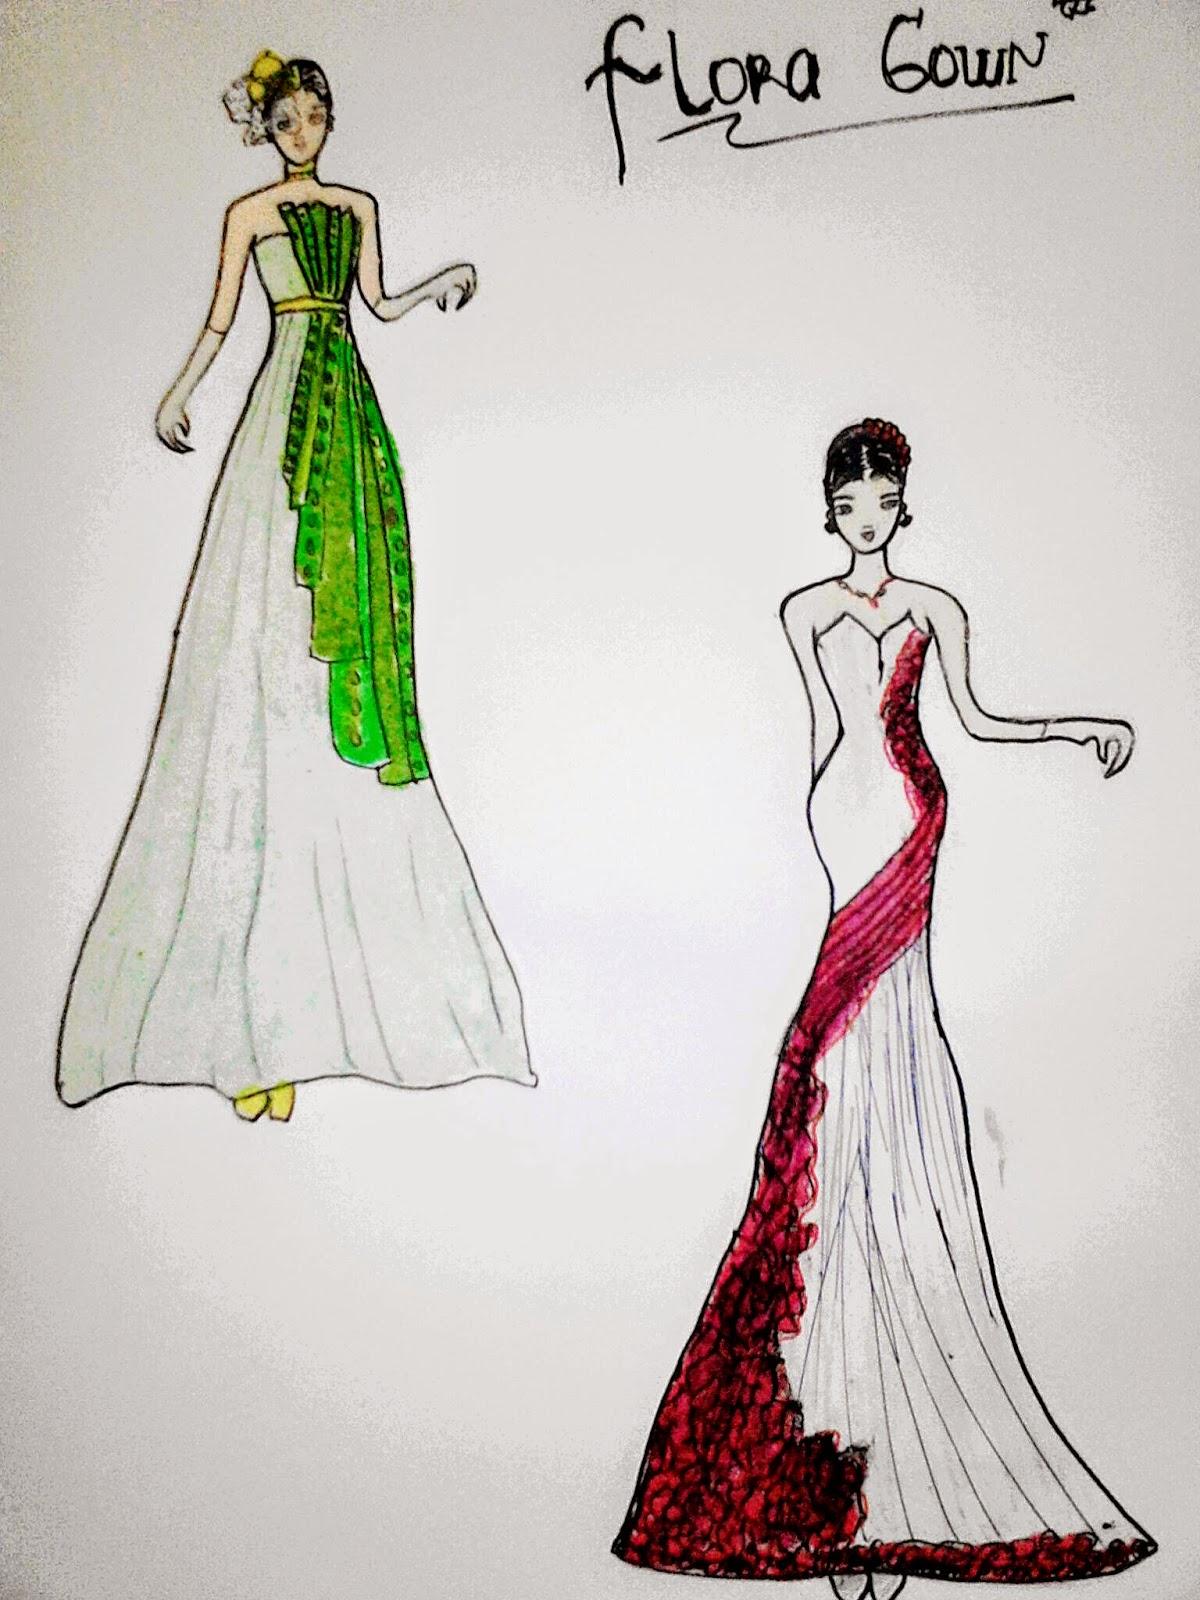 Sketsa Desain Baju Gaun Pesta Klopdesain